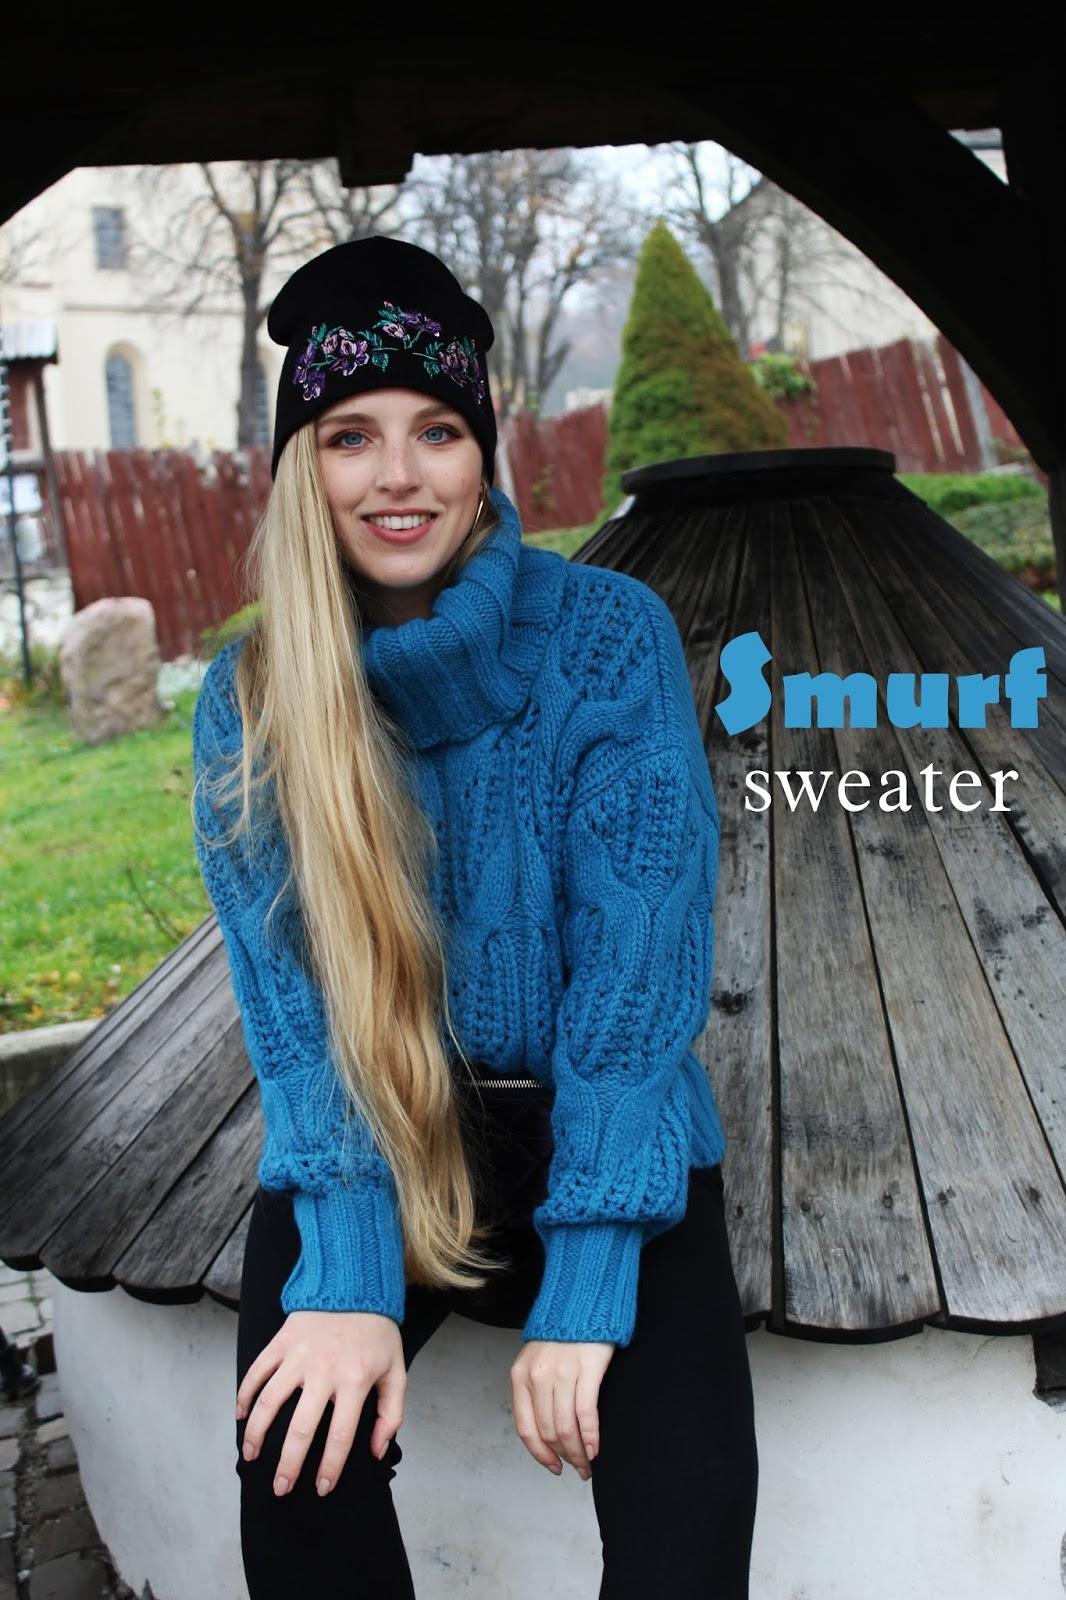 SMURF SWEATER